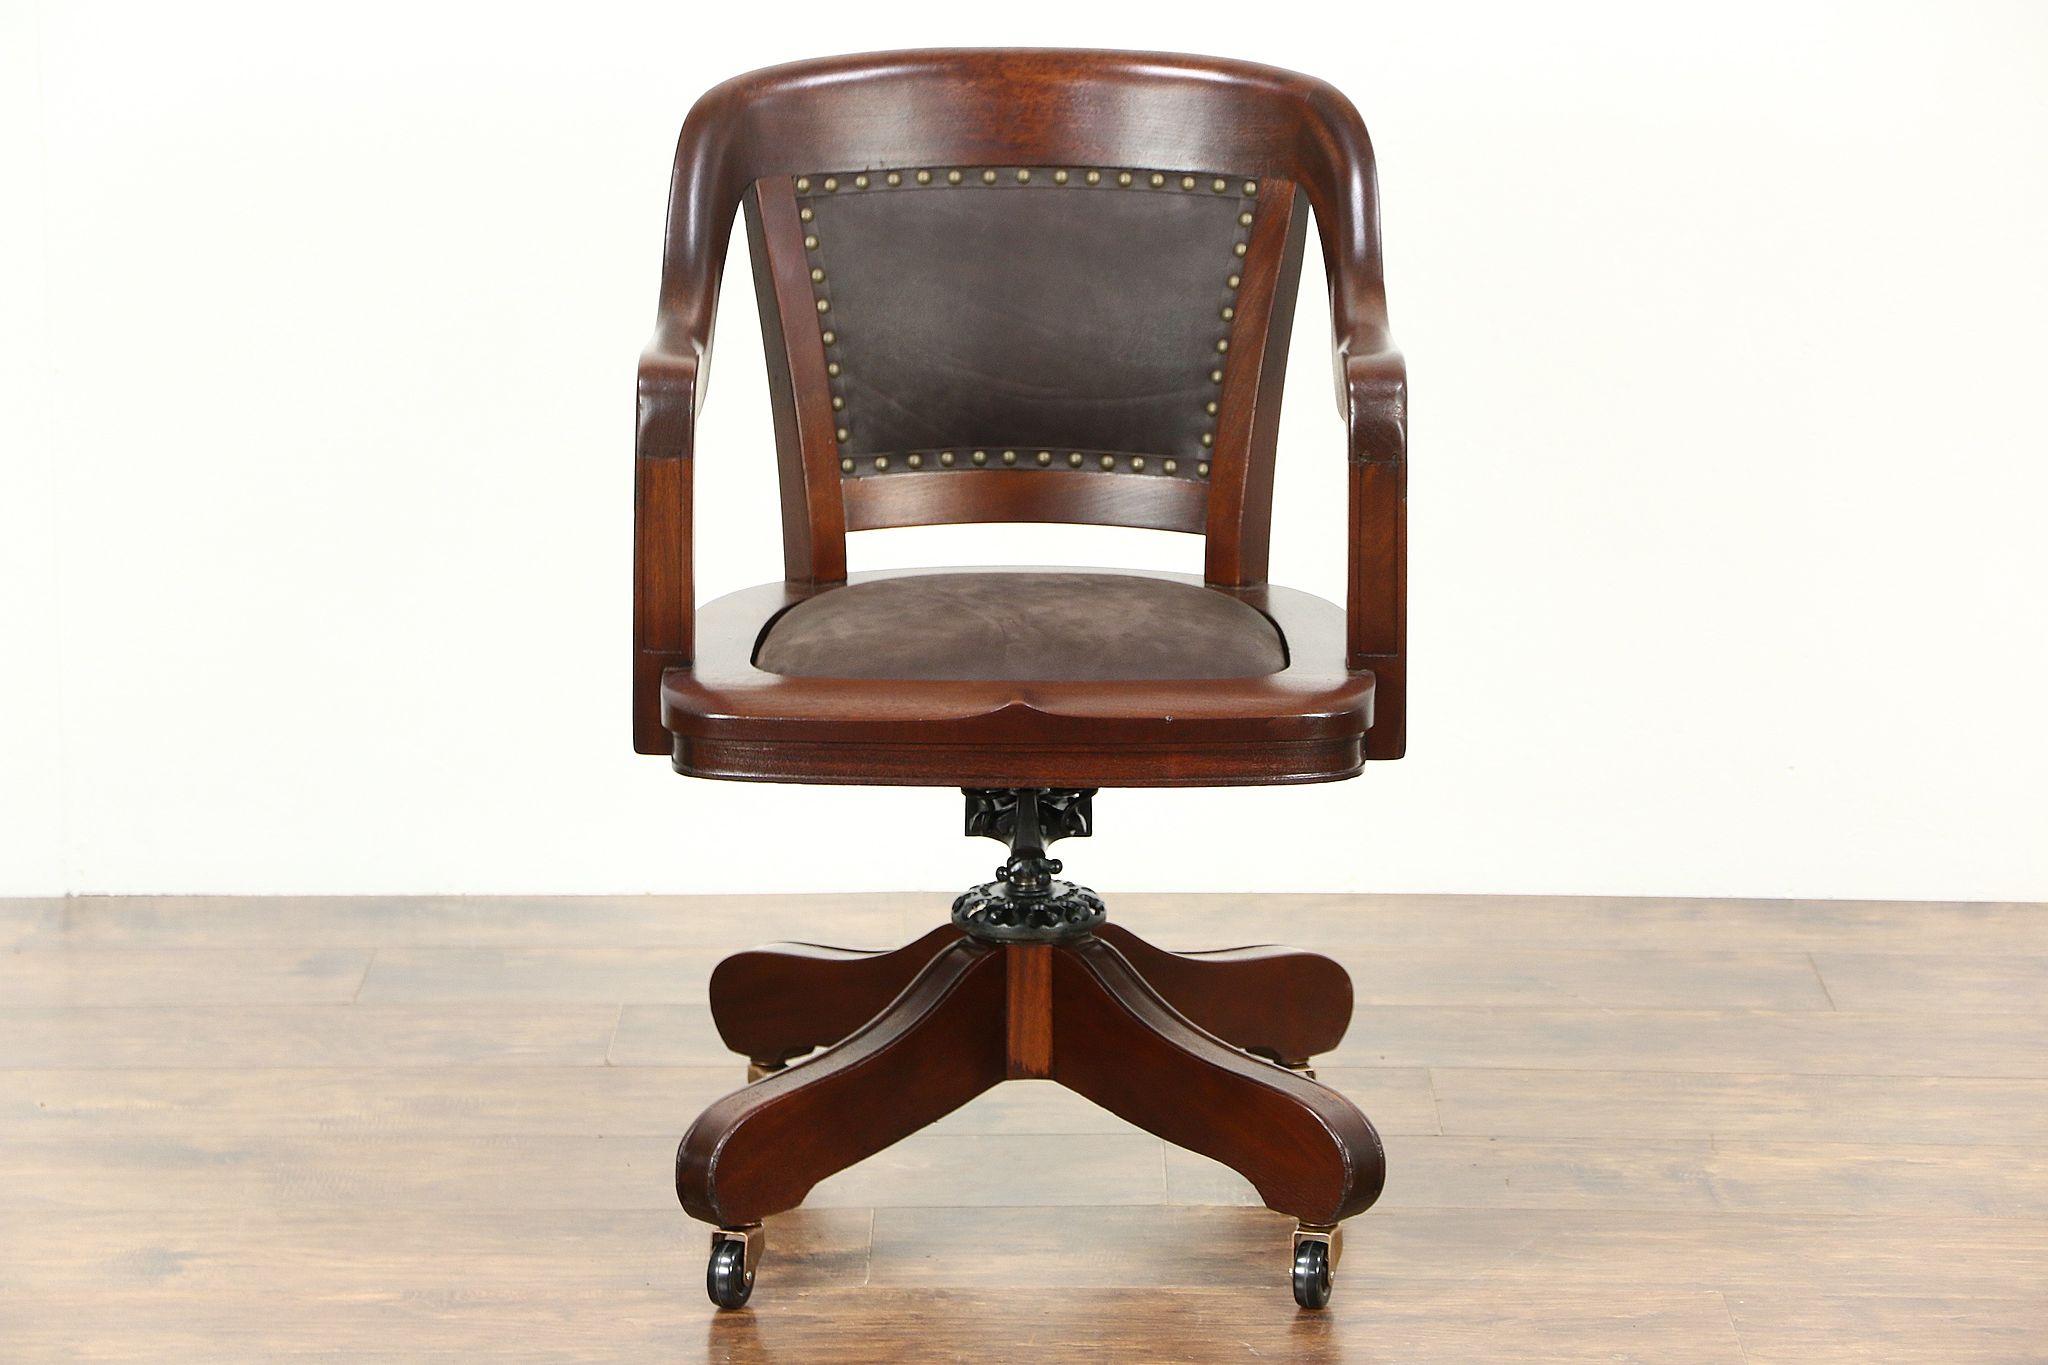 100 antique mahogany desk chair antique mahogany desk chair